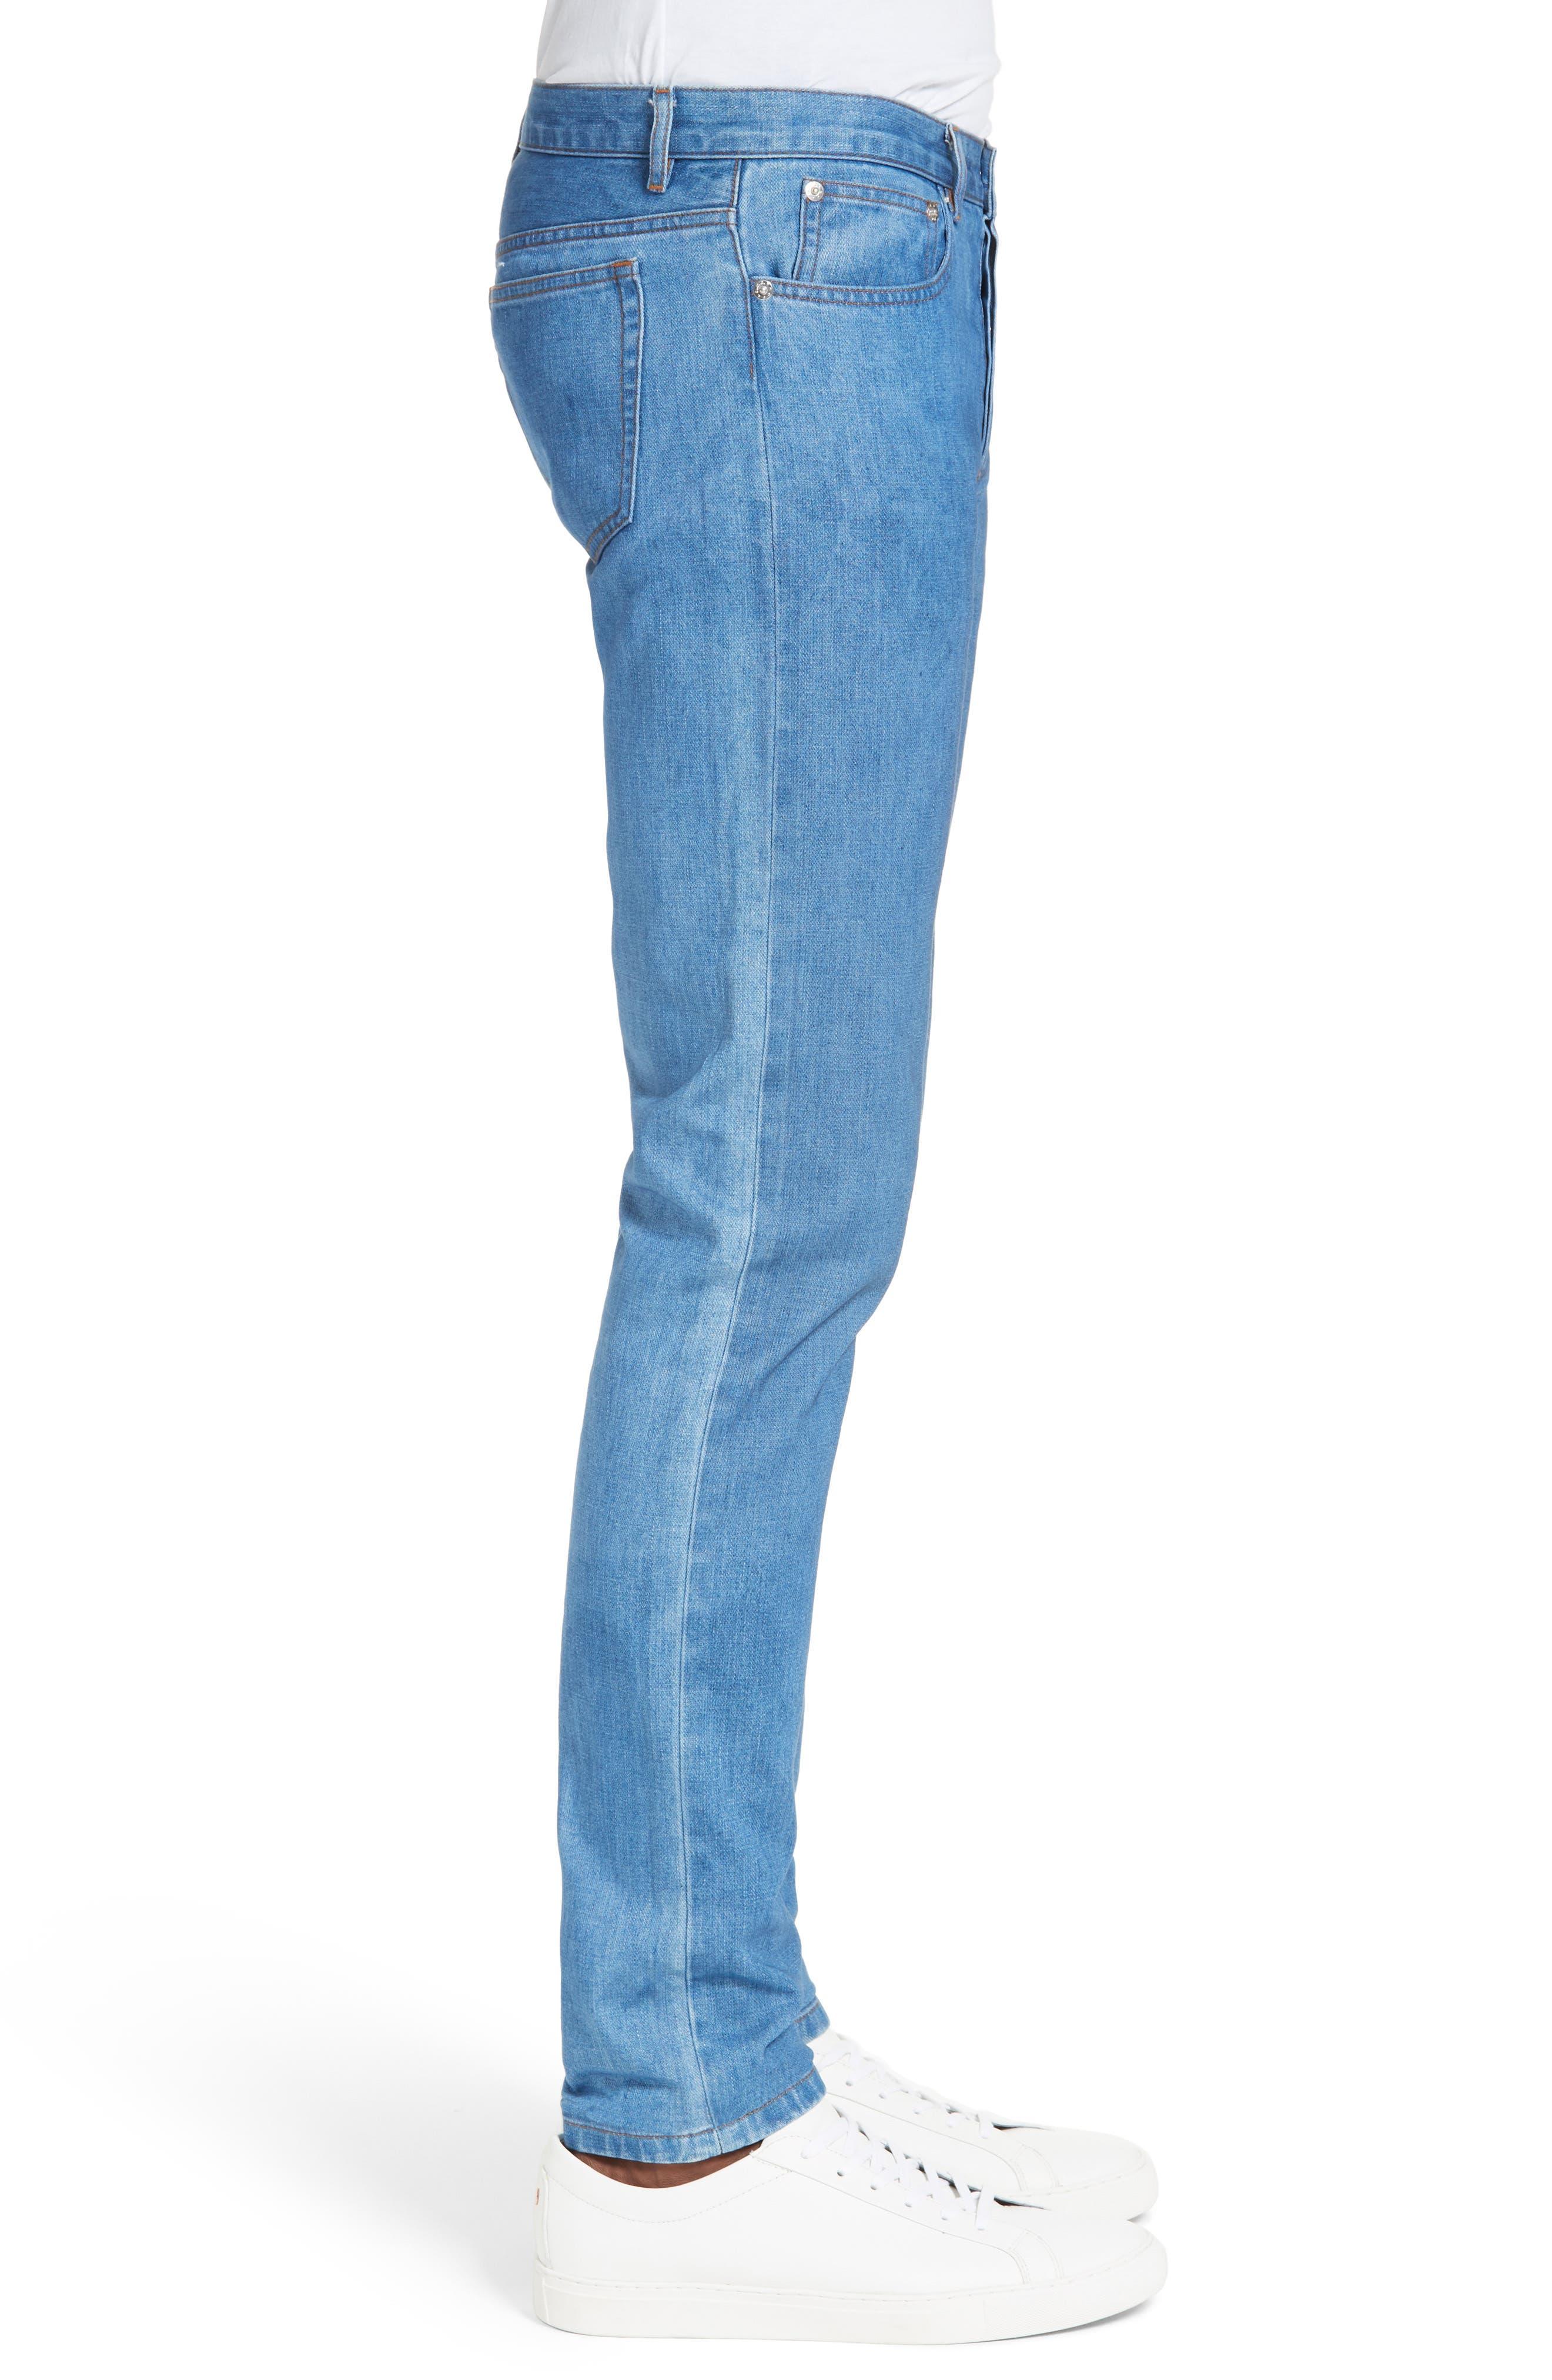 Petit New Standard Slim Fit Jeans,                             Alternate thumbnail 2, color,                             461